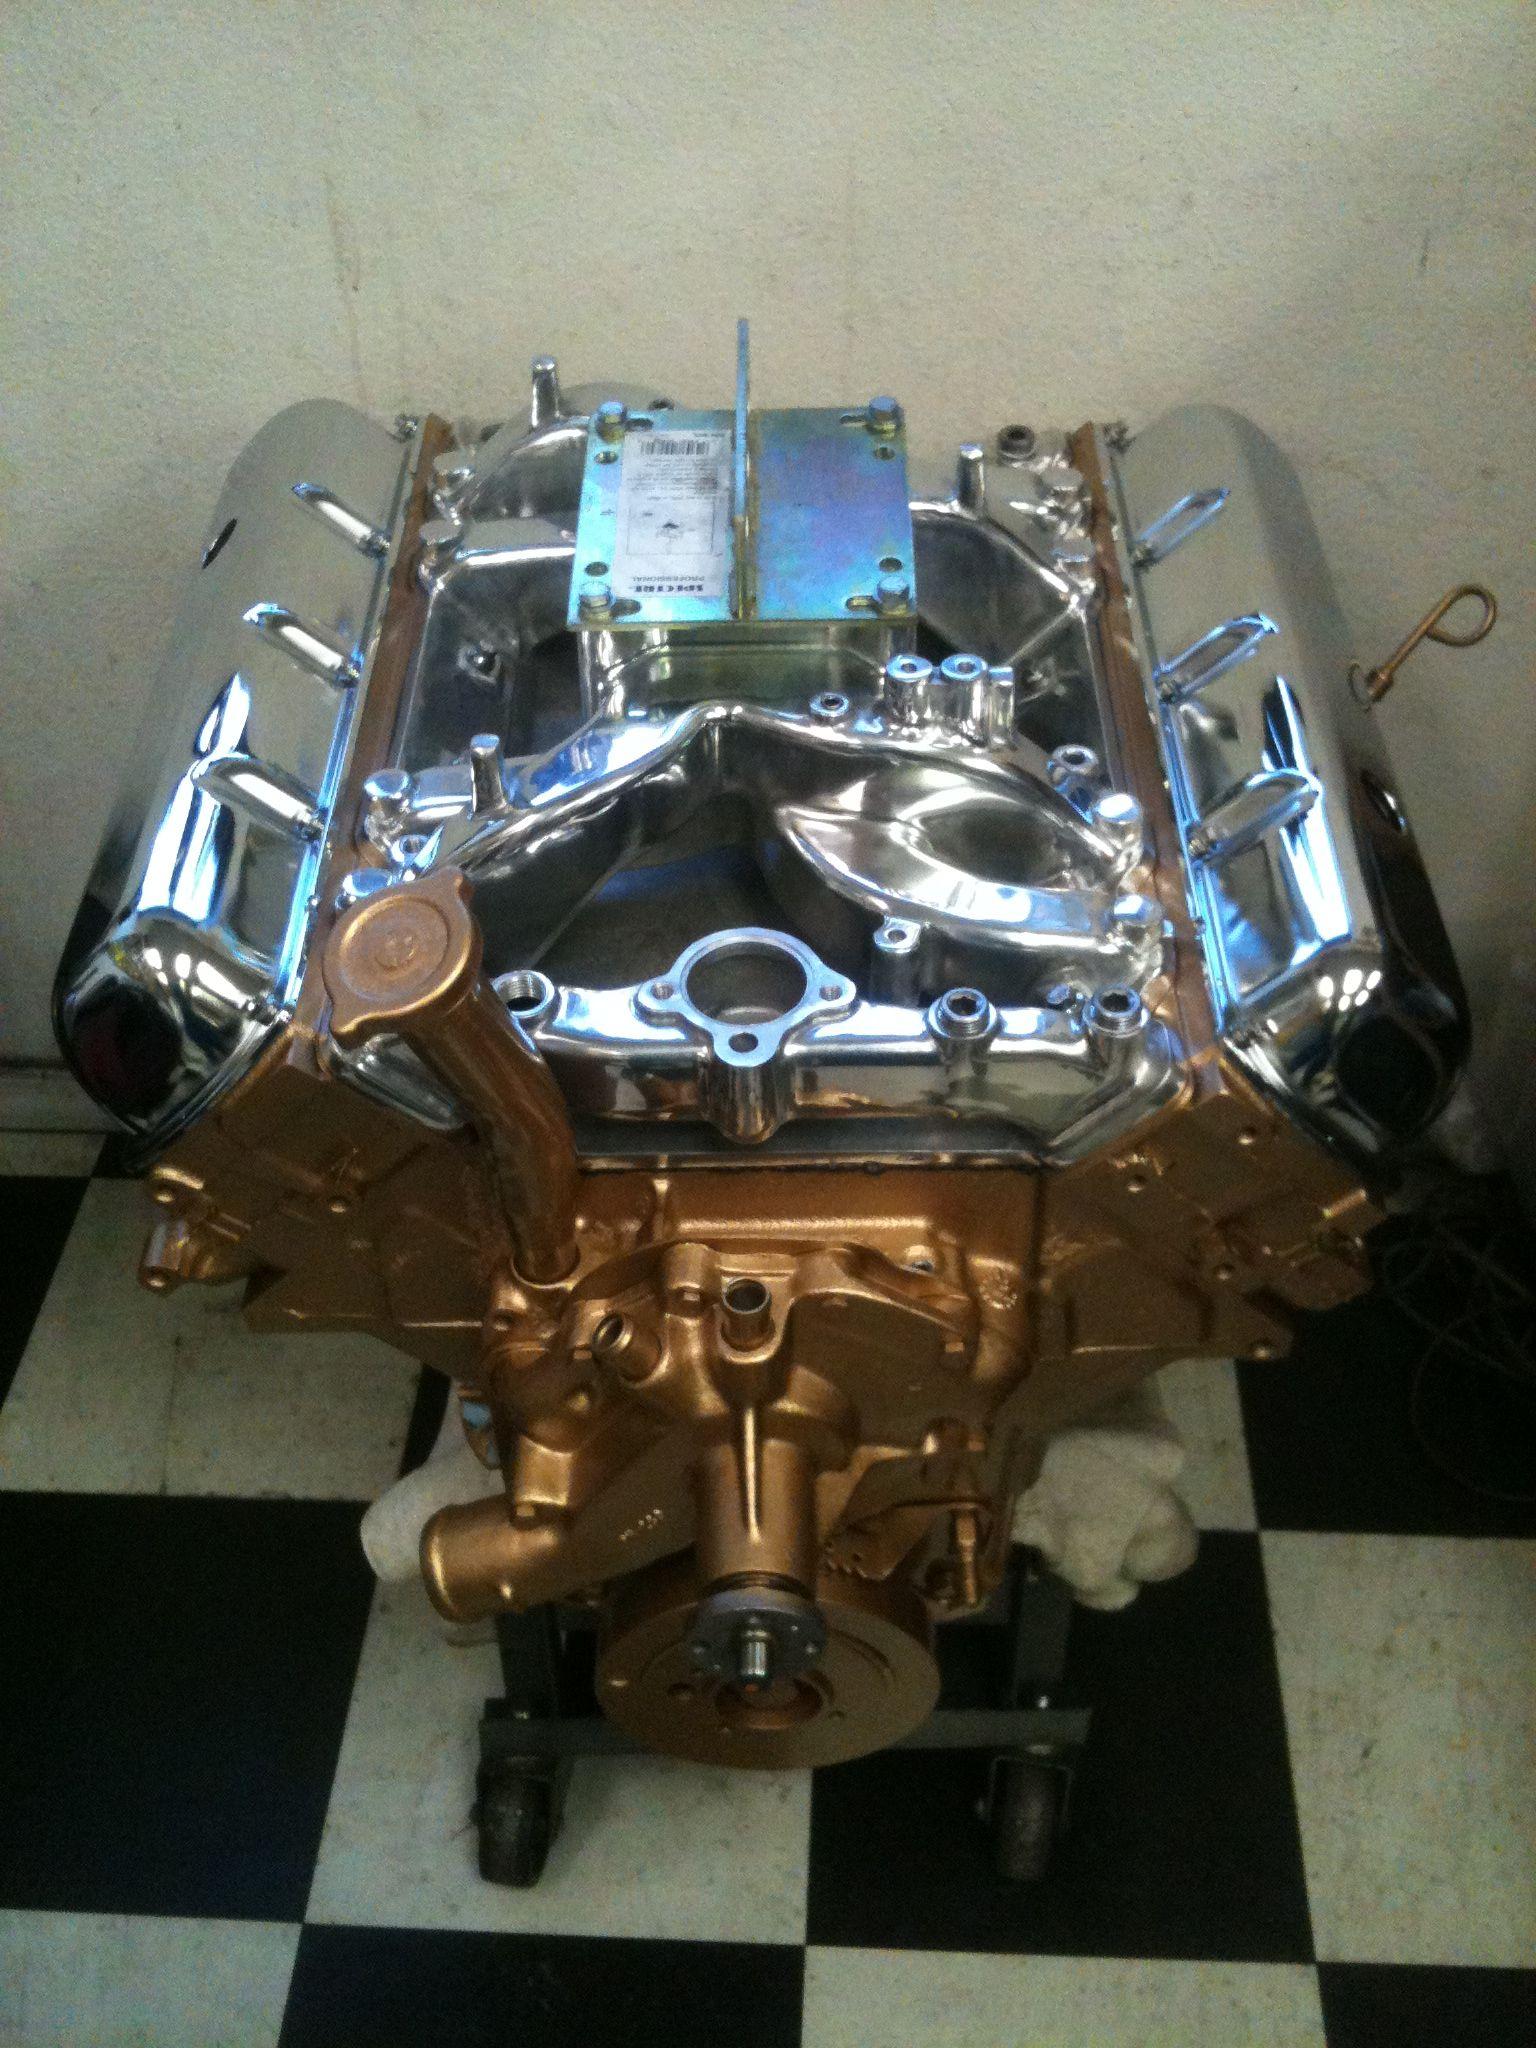 Total rebuild on Oldsmobile 455 Engine! | 1965 442 Cutlass